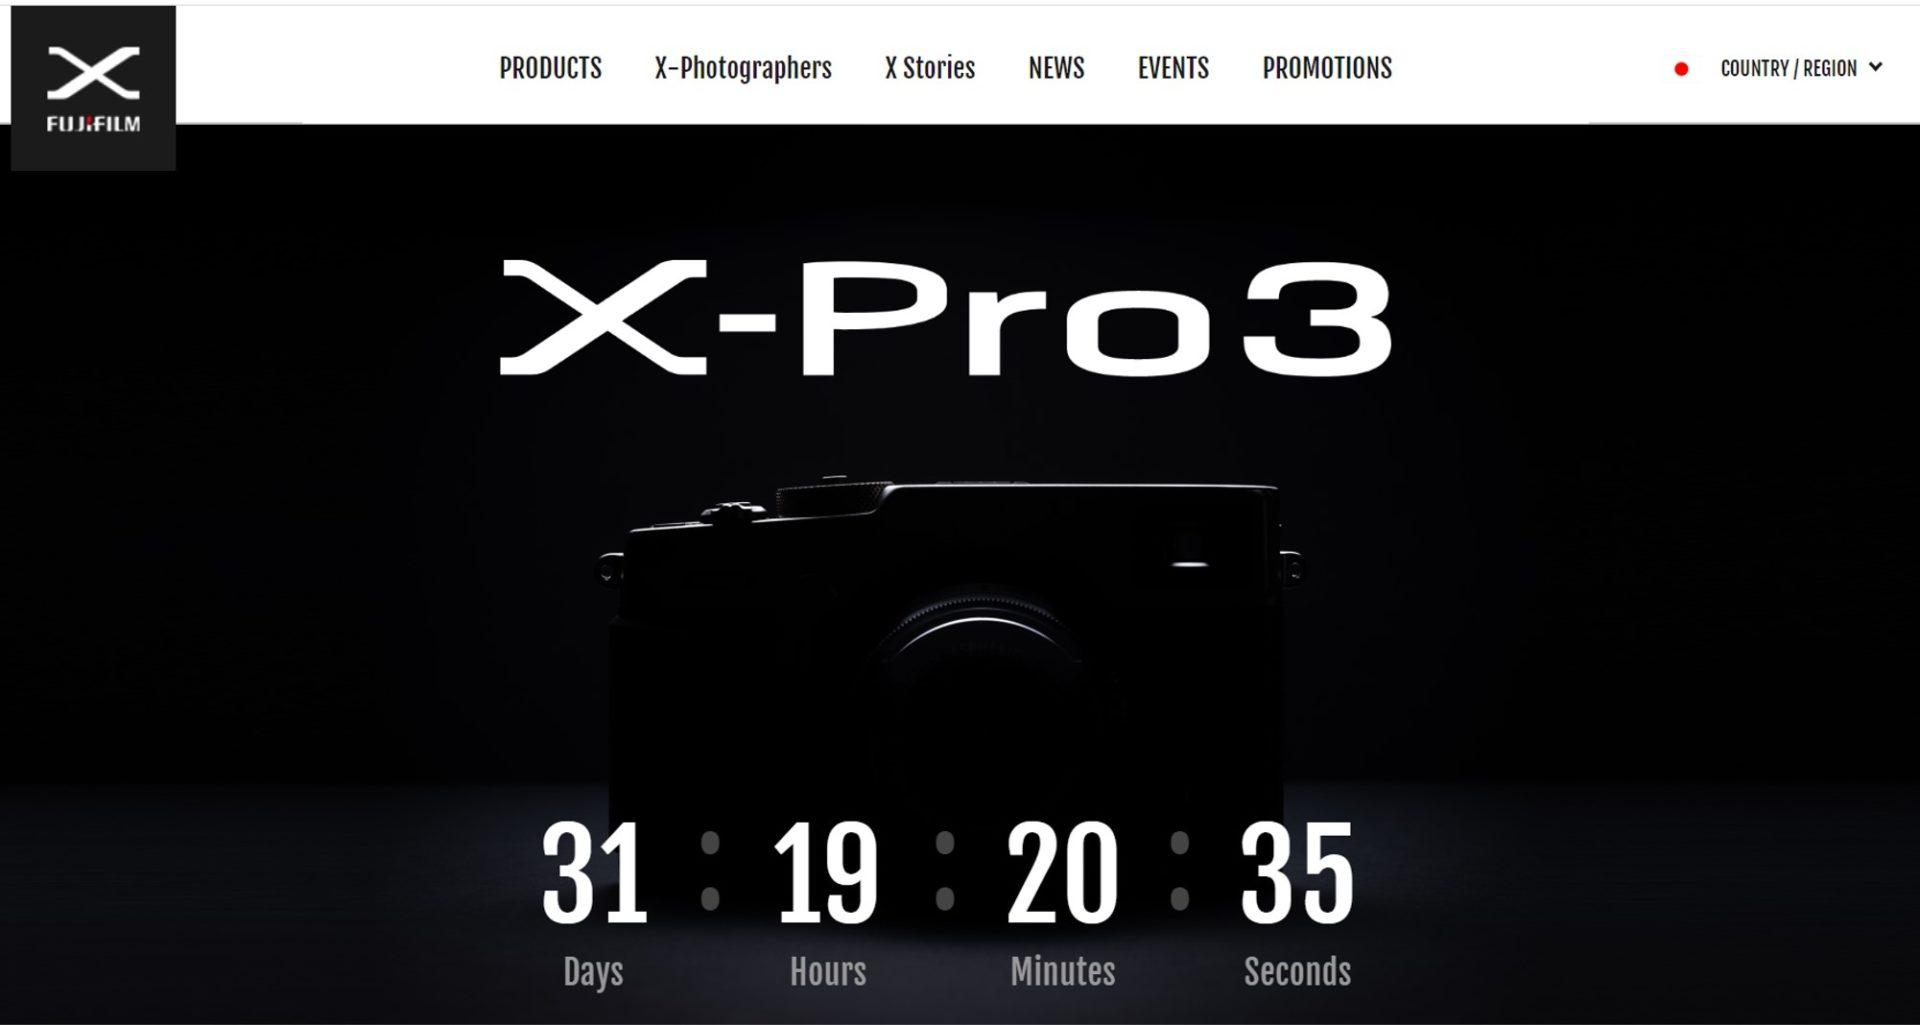 X pro 3